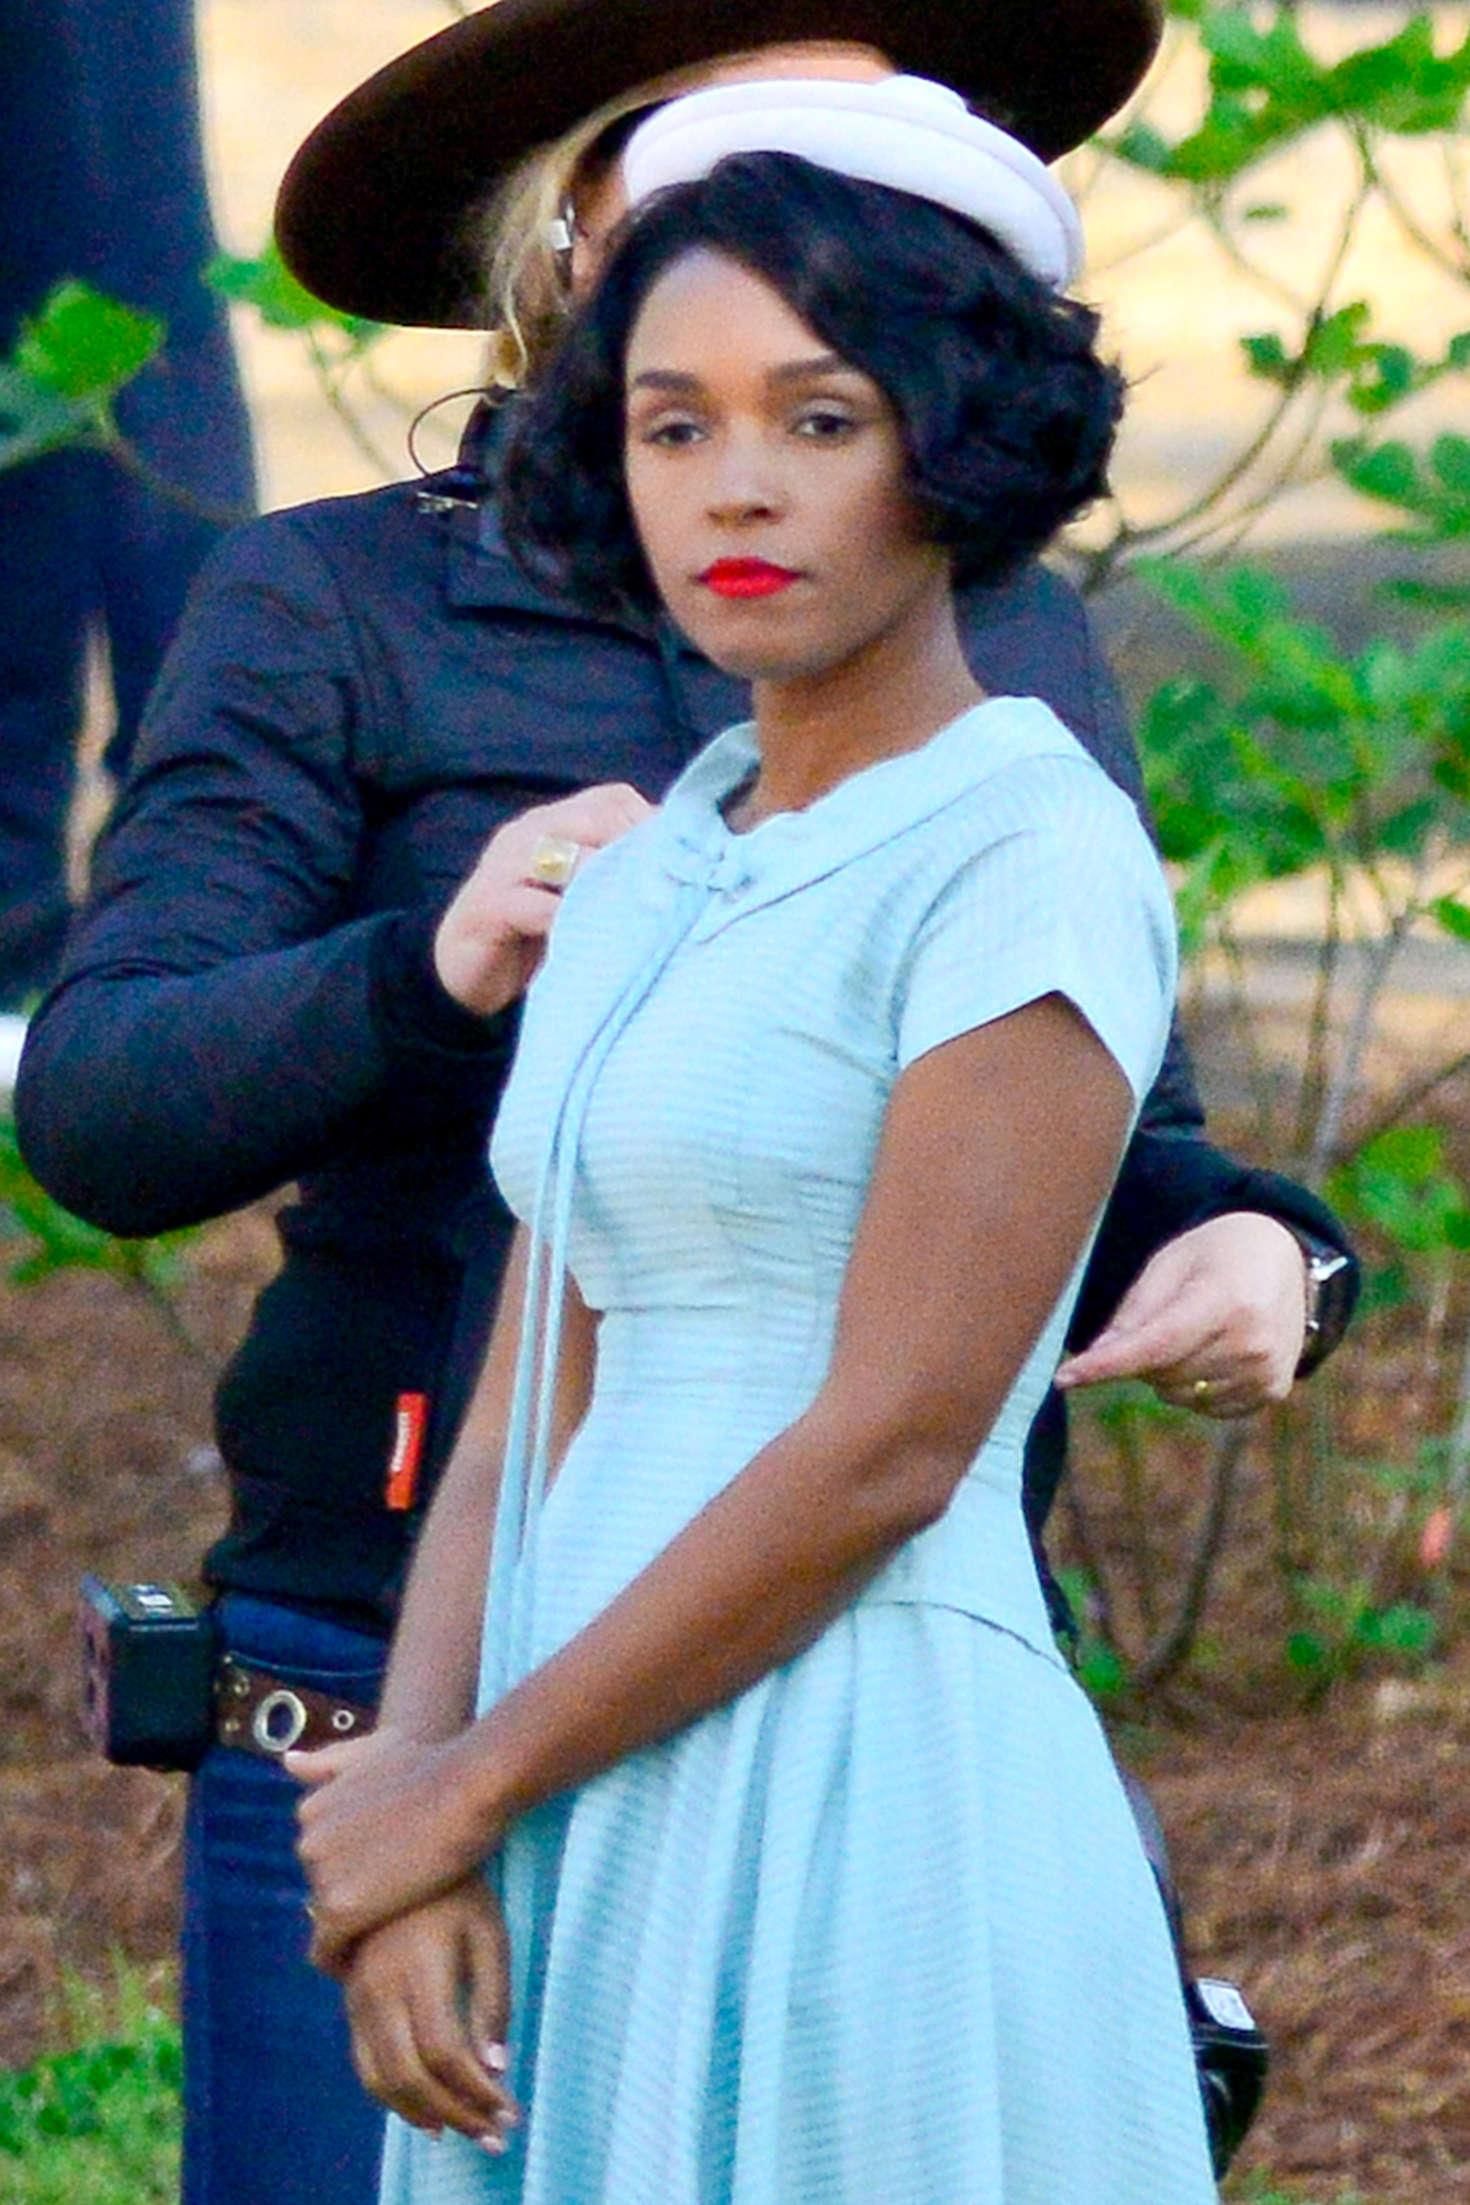 Janelle Monae - Filming on the set of 'Hidden Figures' in Atlanta